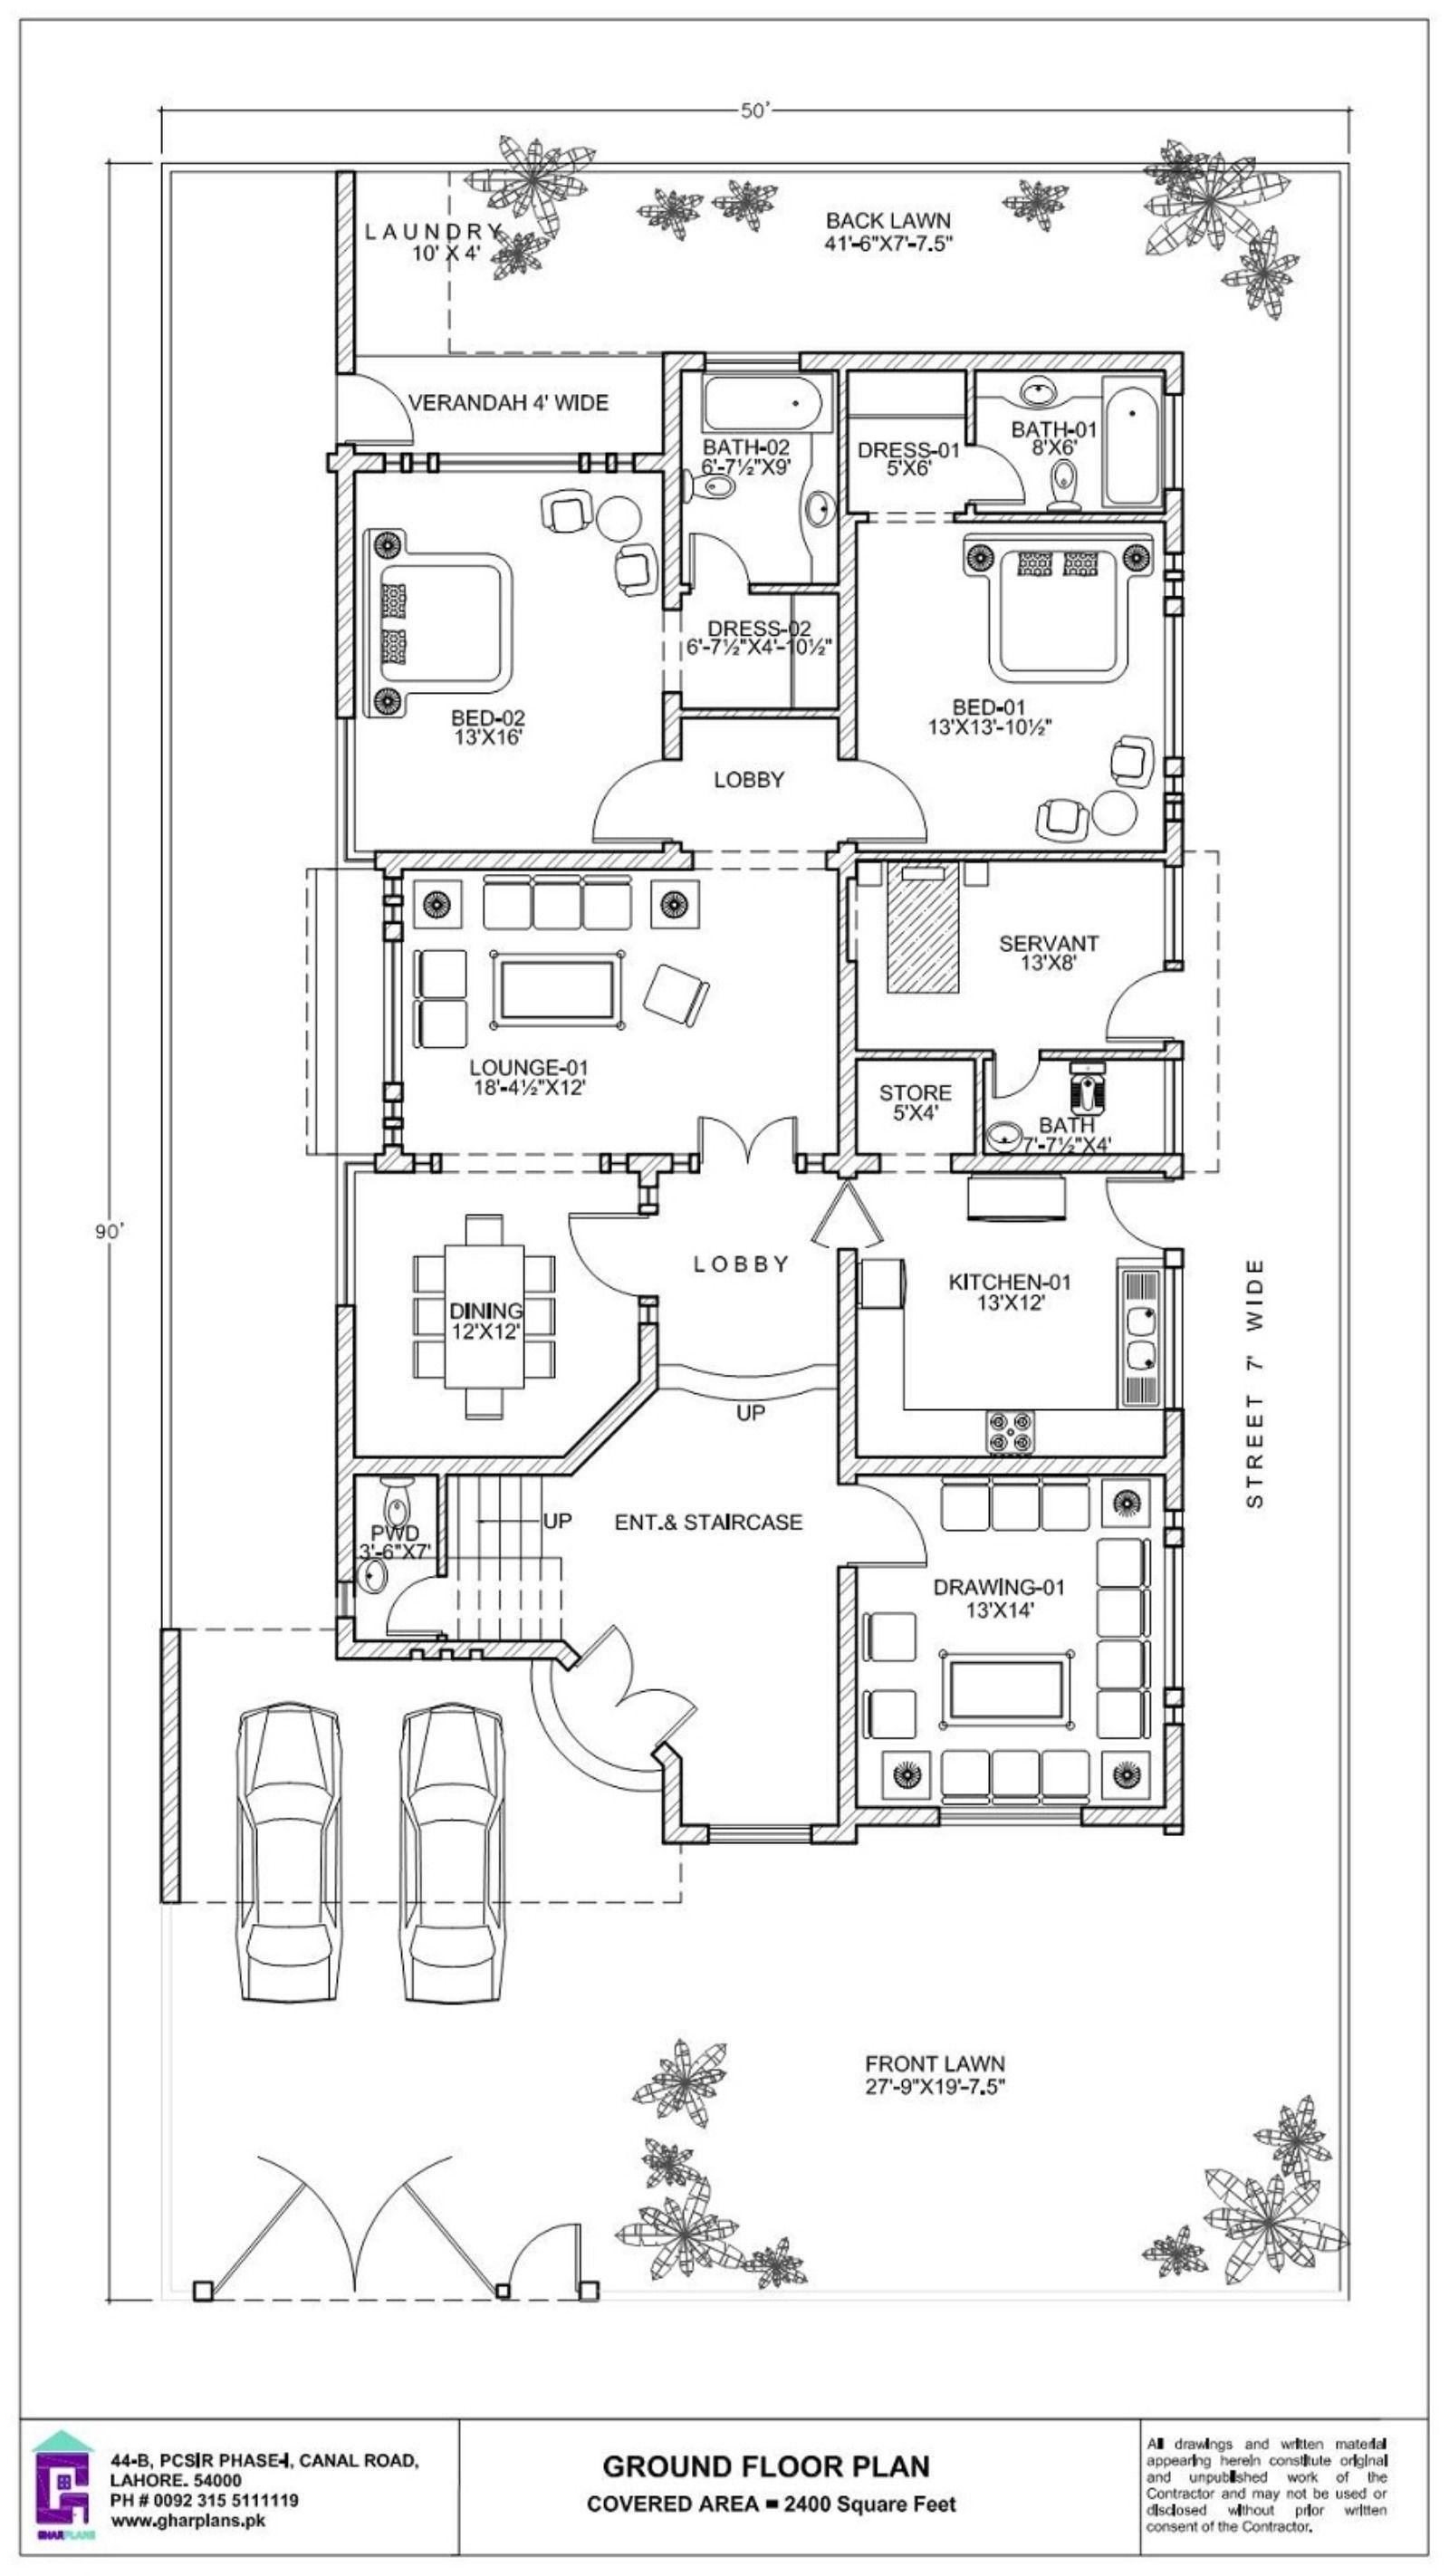 Drawingroomentrance Floor Ground House Plan Square Yard 500 Square Yard House Ground Floor Plan 50 X 90 Ground Floor Plan Floor Plan Layout Floor Plans